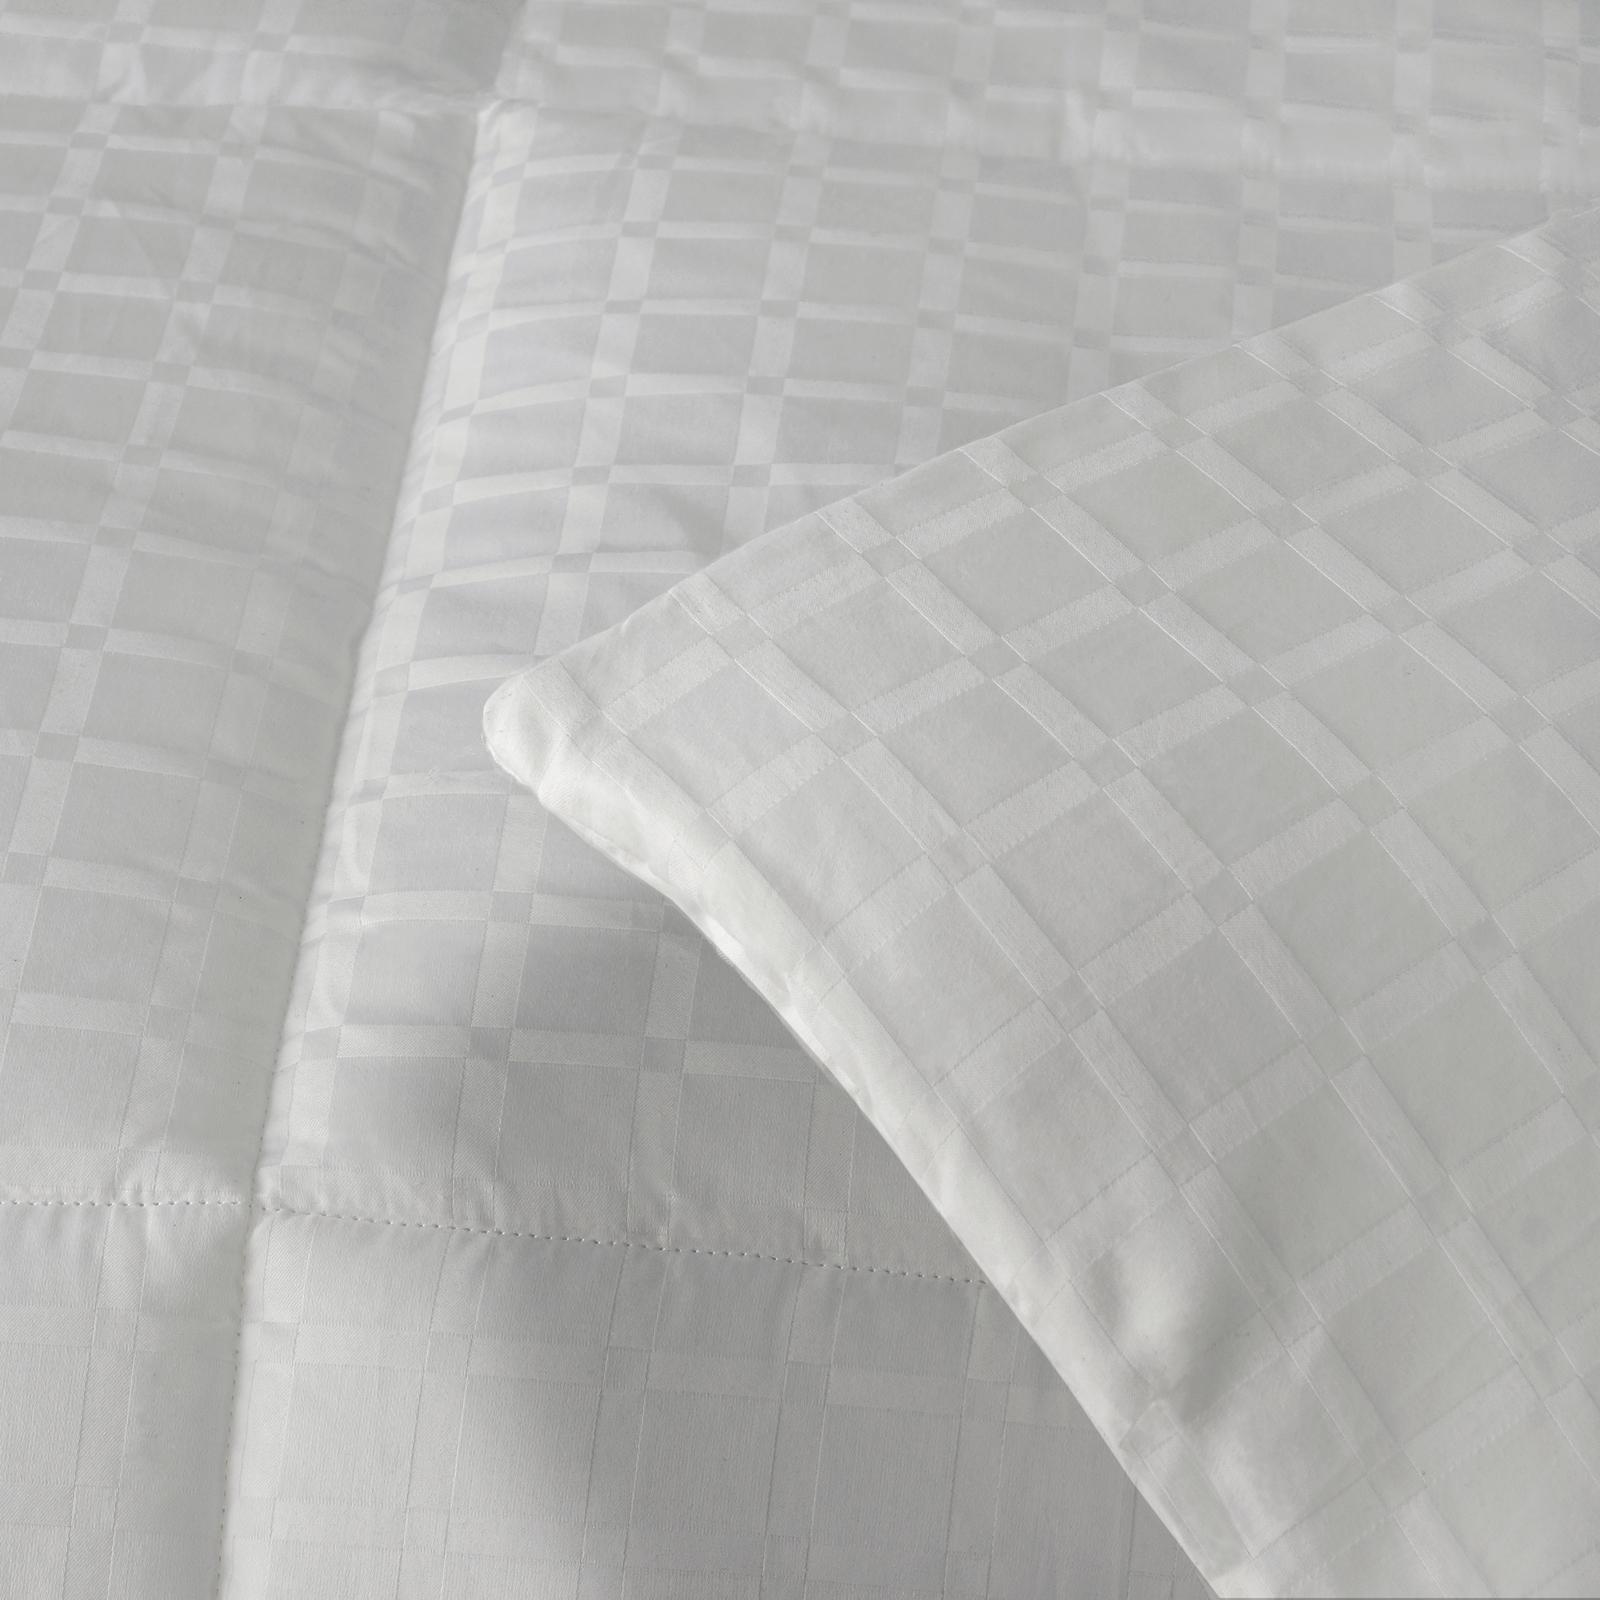 Amaze by welspun cotton sheet set bedding king navy blue - Amaze By Welspun Cotton Sheet Set Bedding King Navy Blue 35